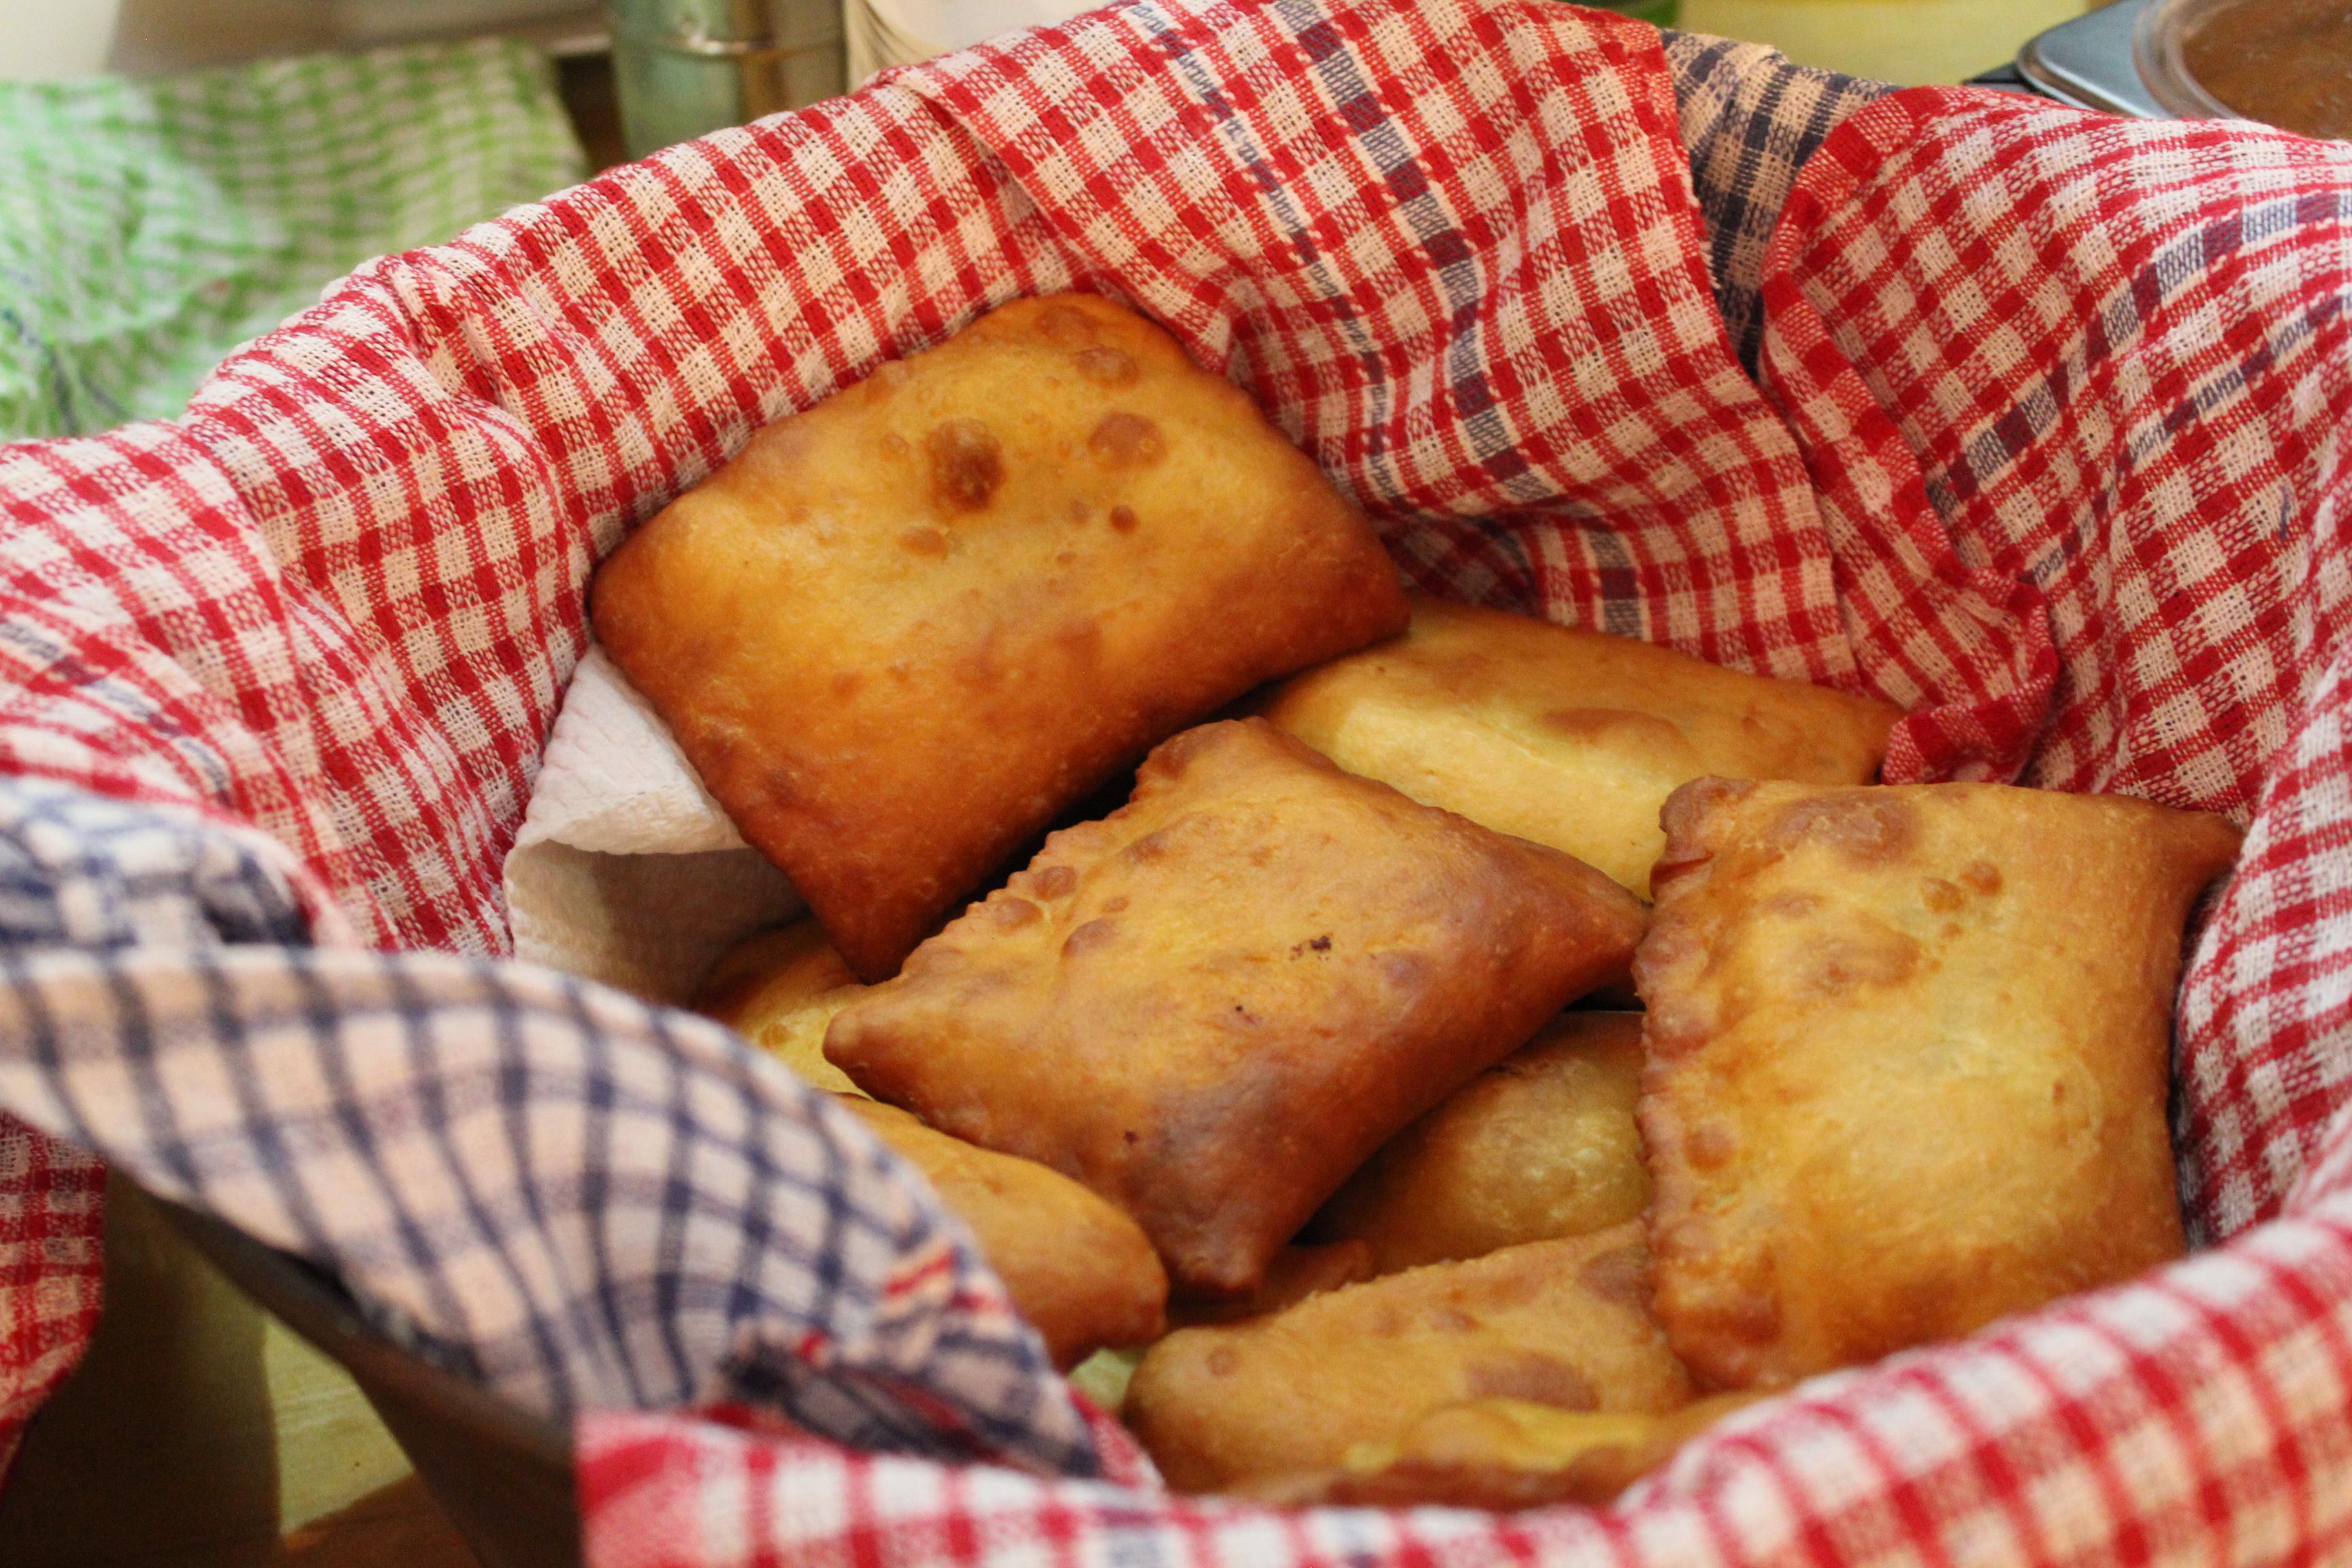 Food And Fun At The Food Circus Take Me To Foodie Heaven